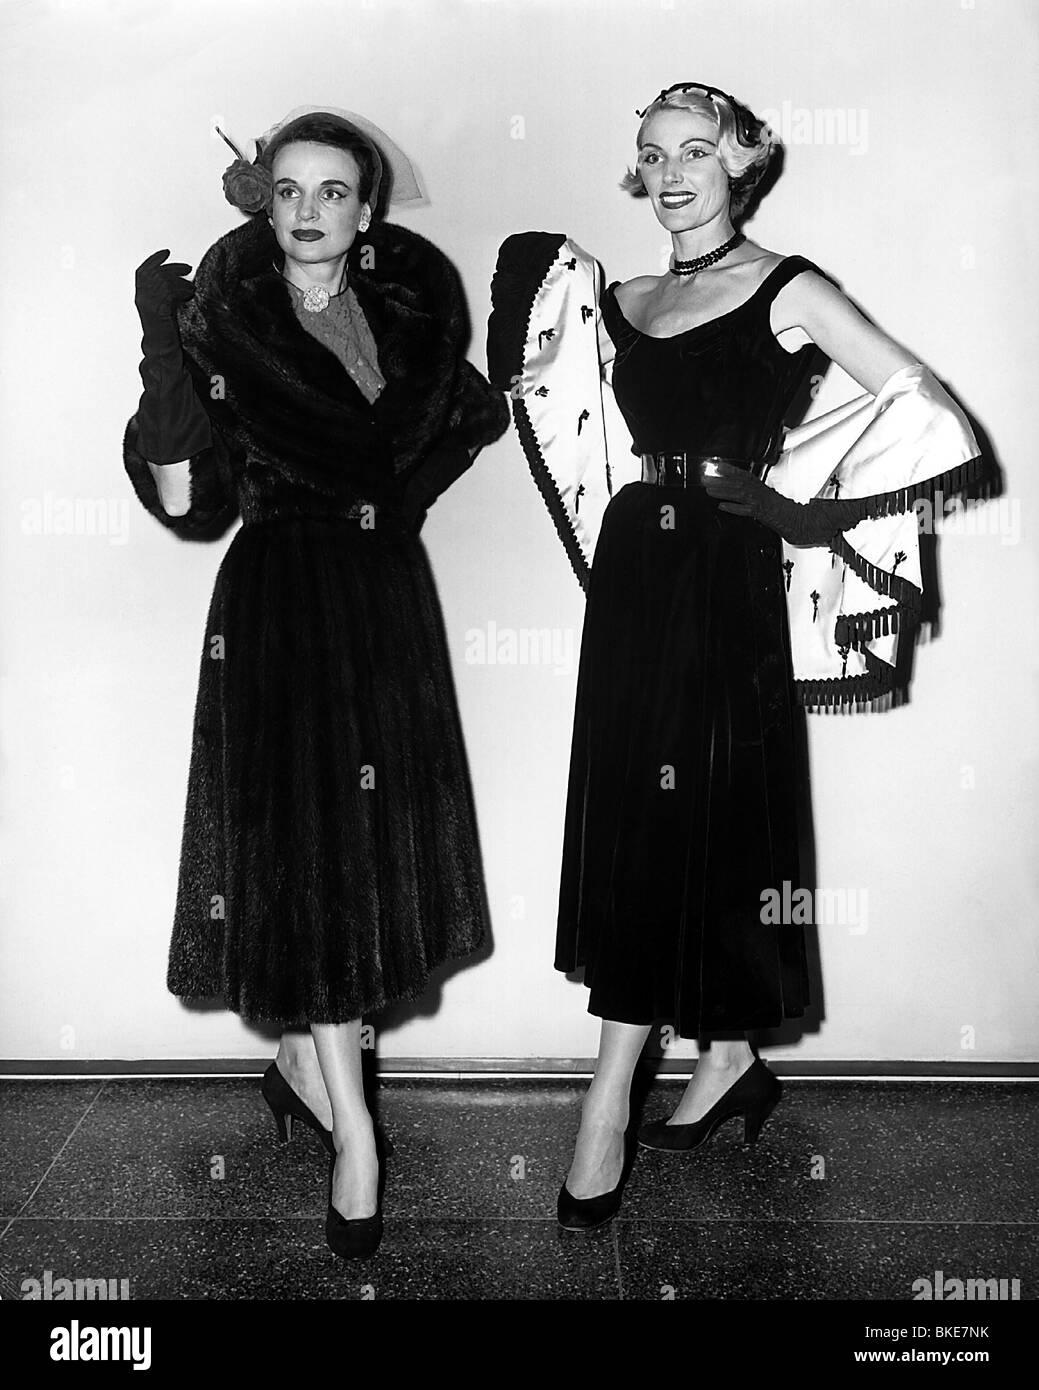 womens fashion 1900 to 1940 black models picture. Black Bedroom Furniture Sets. Home Design Ideas